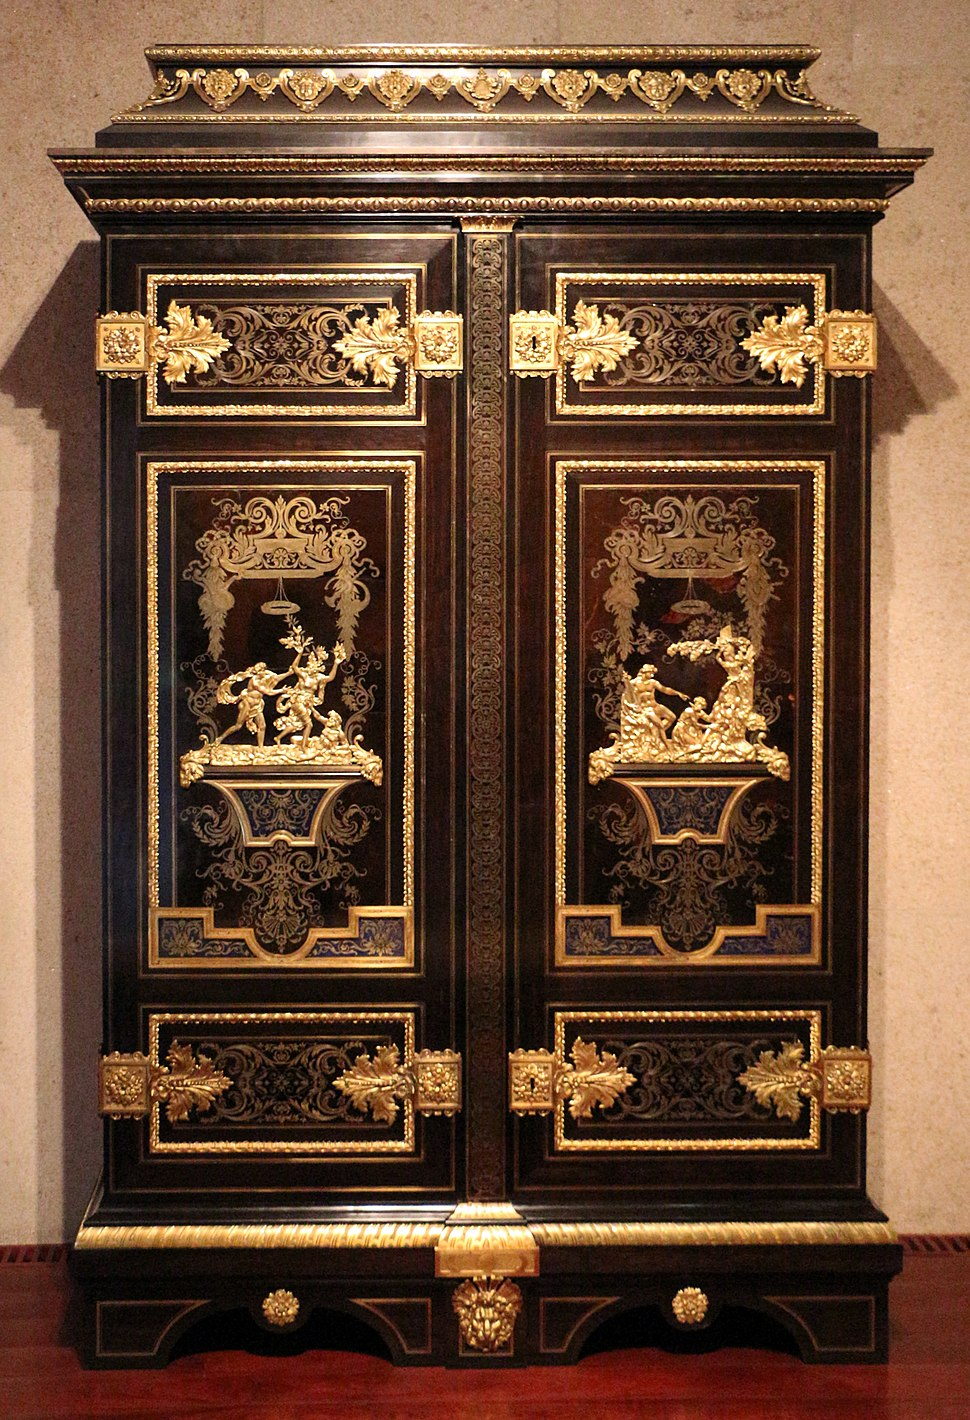 André-charles boulle (attr.), armario, parigi 1700 ca